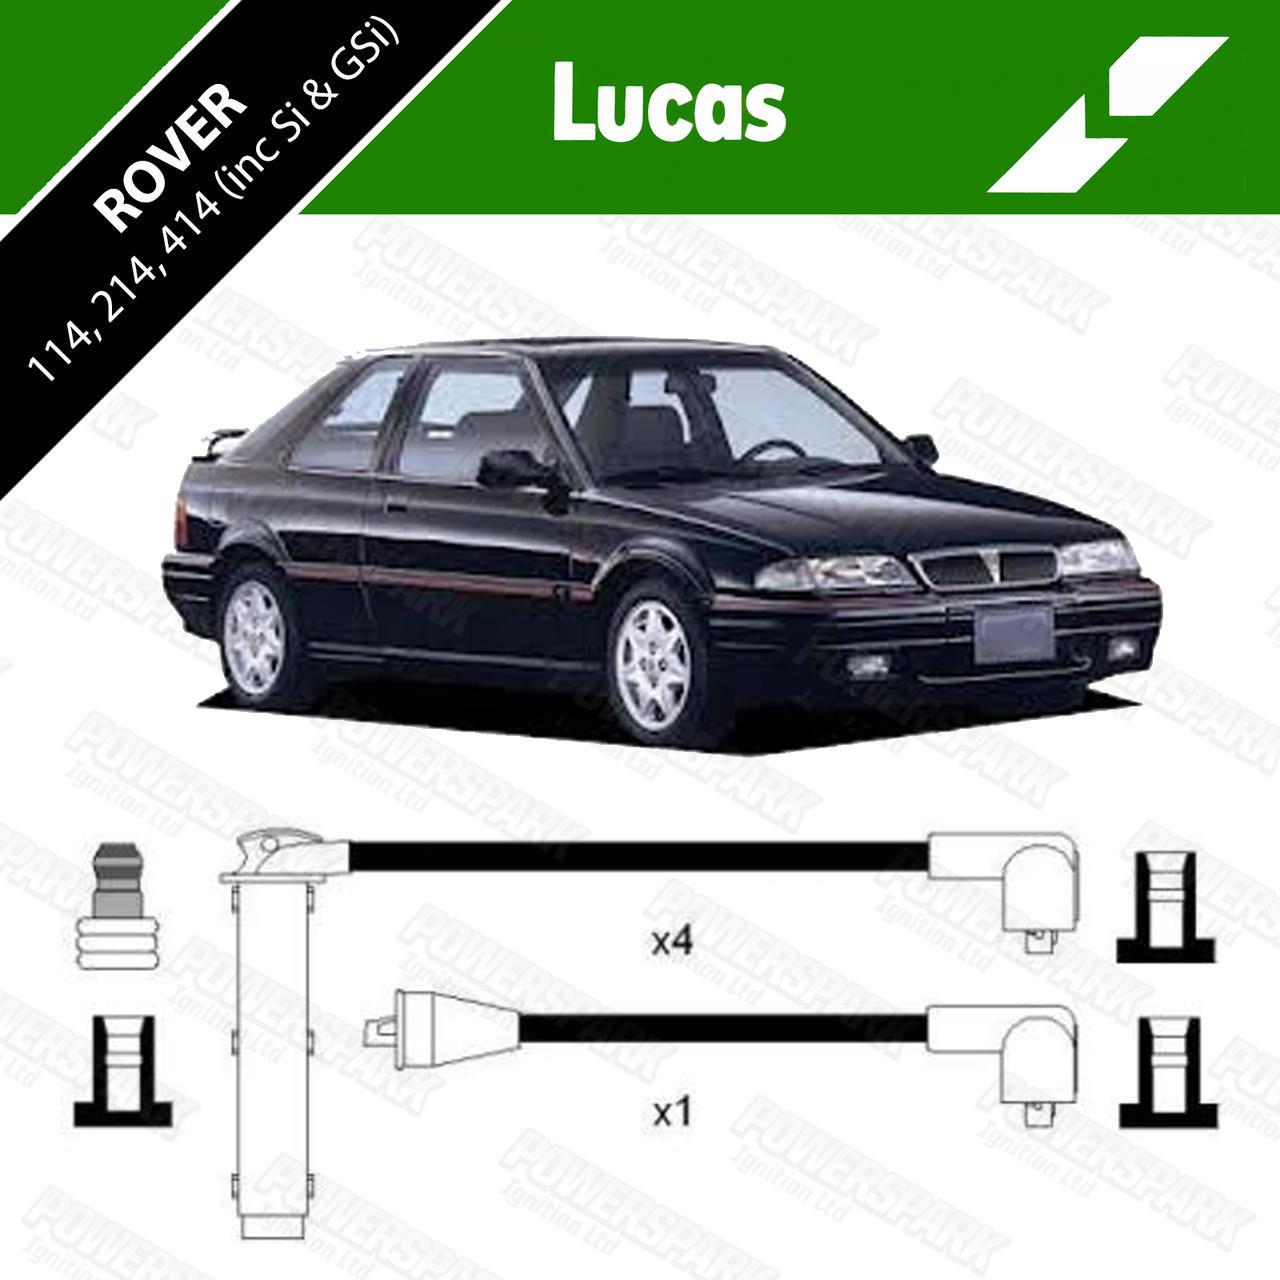 Lucas Rover 114, 214, 414 inc Si and GSI Genuine Lucas HT leads DKB406